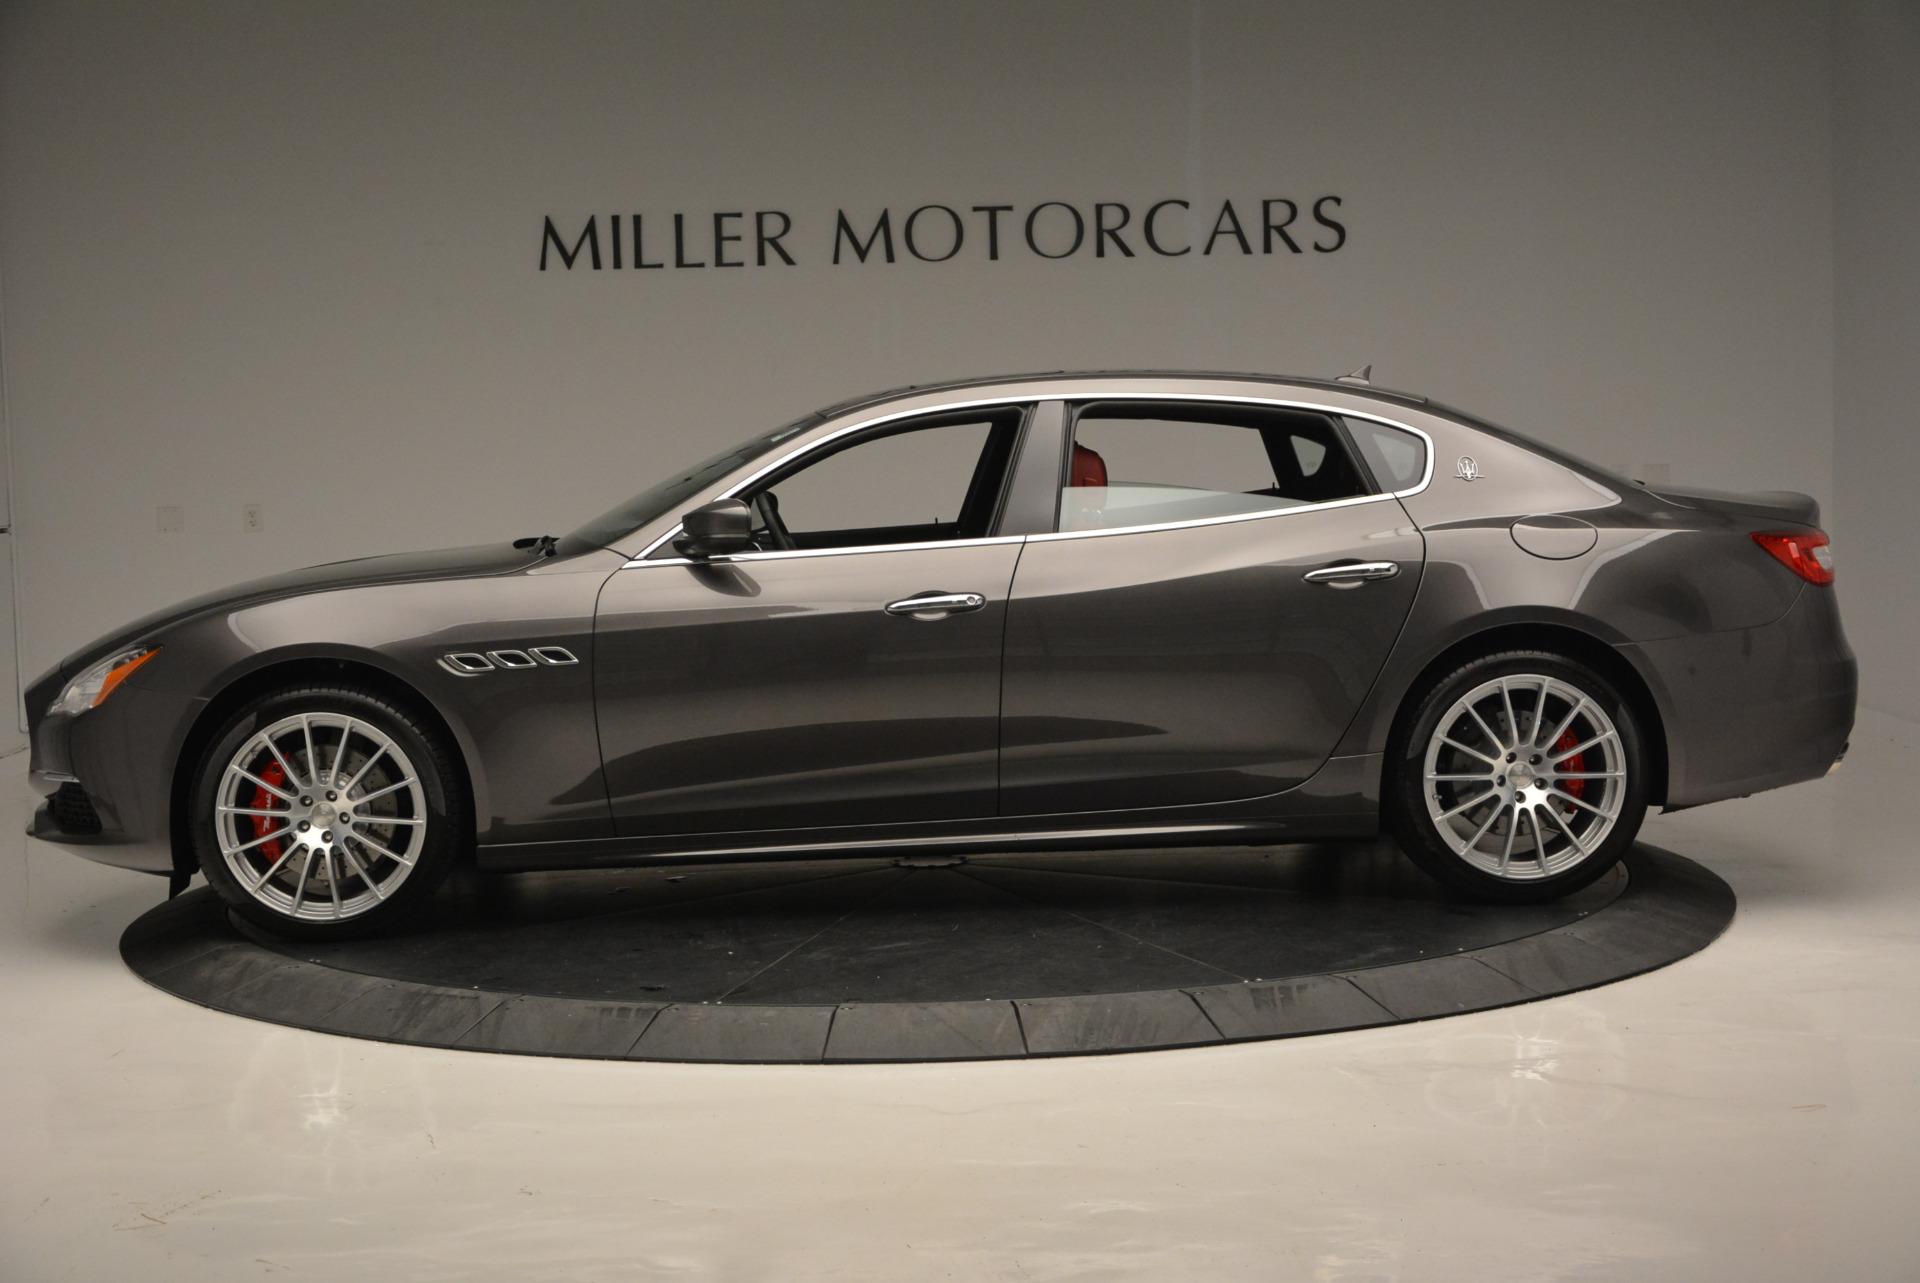 https://www.millermotorcars.com/galleria_images/585/585_p3_l.jpg